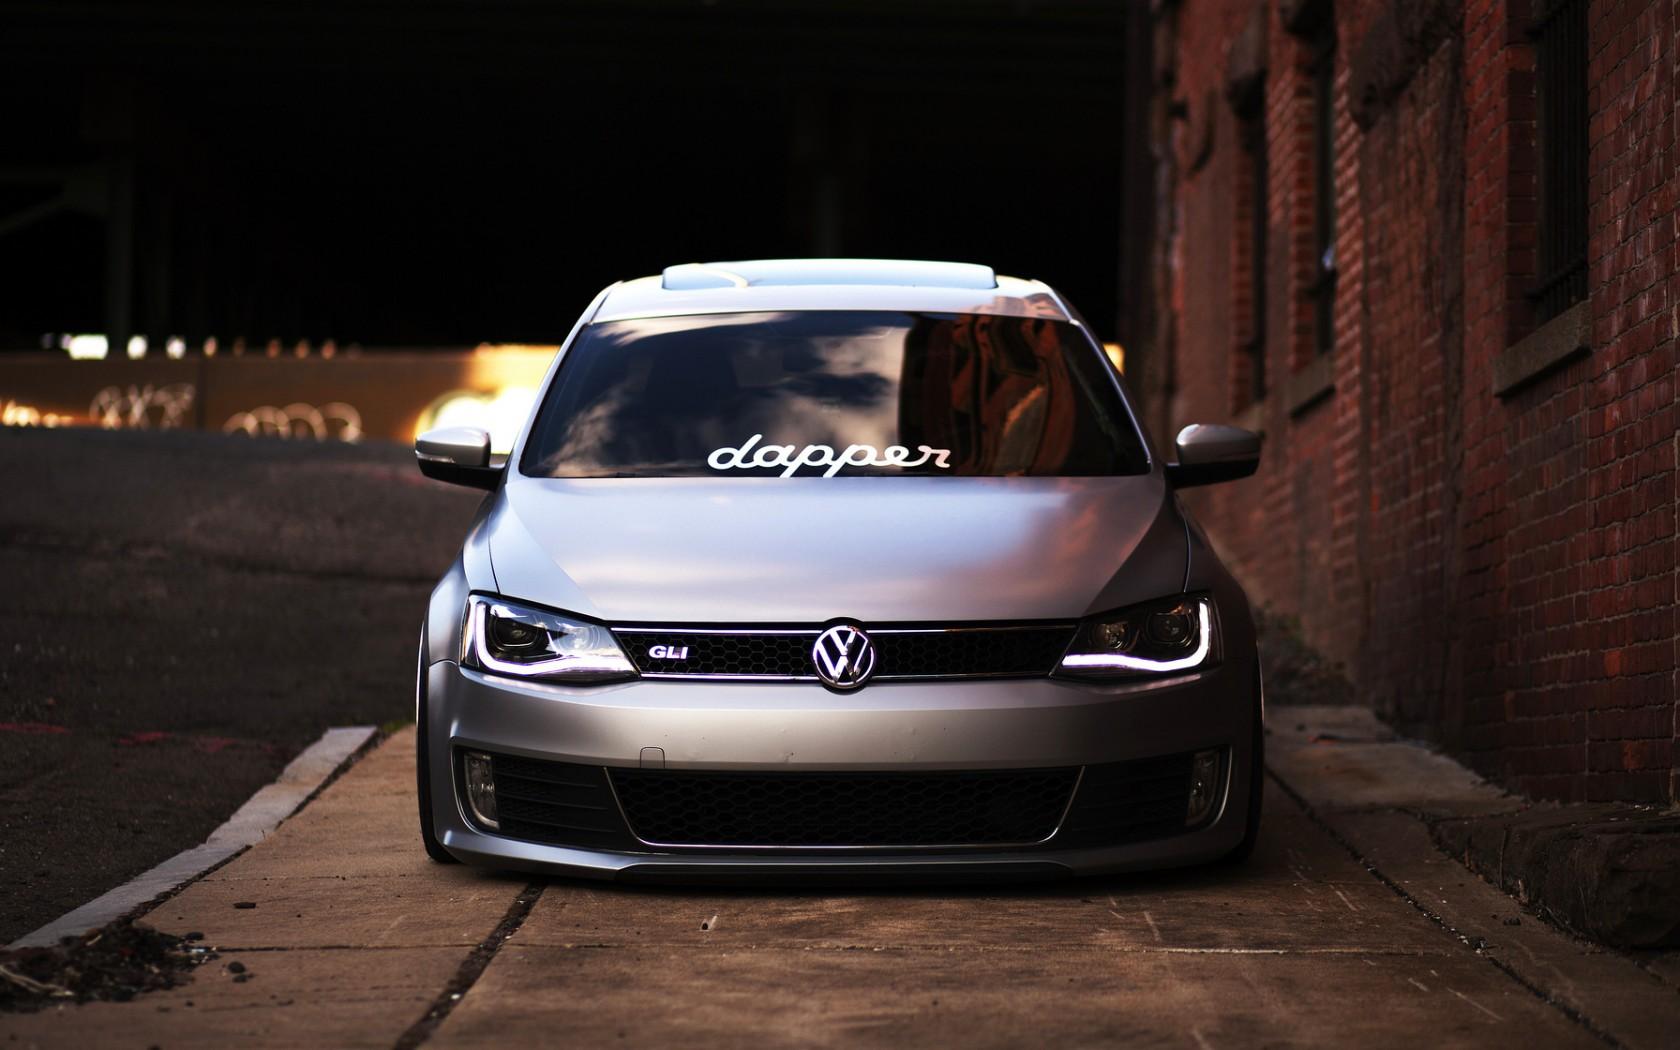 Volkswagen Golf Wallpaper And Background Image